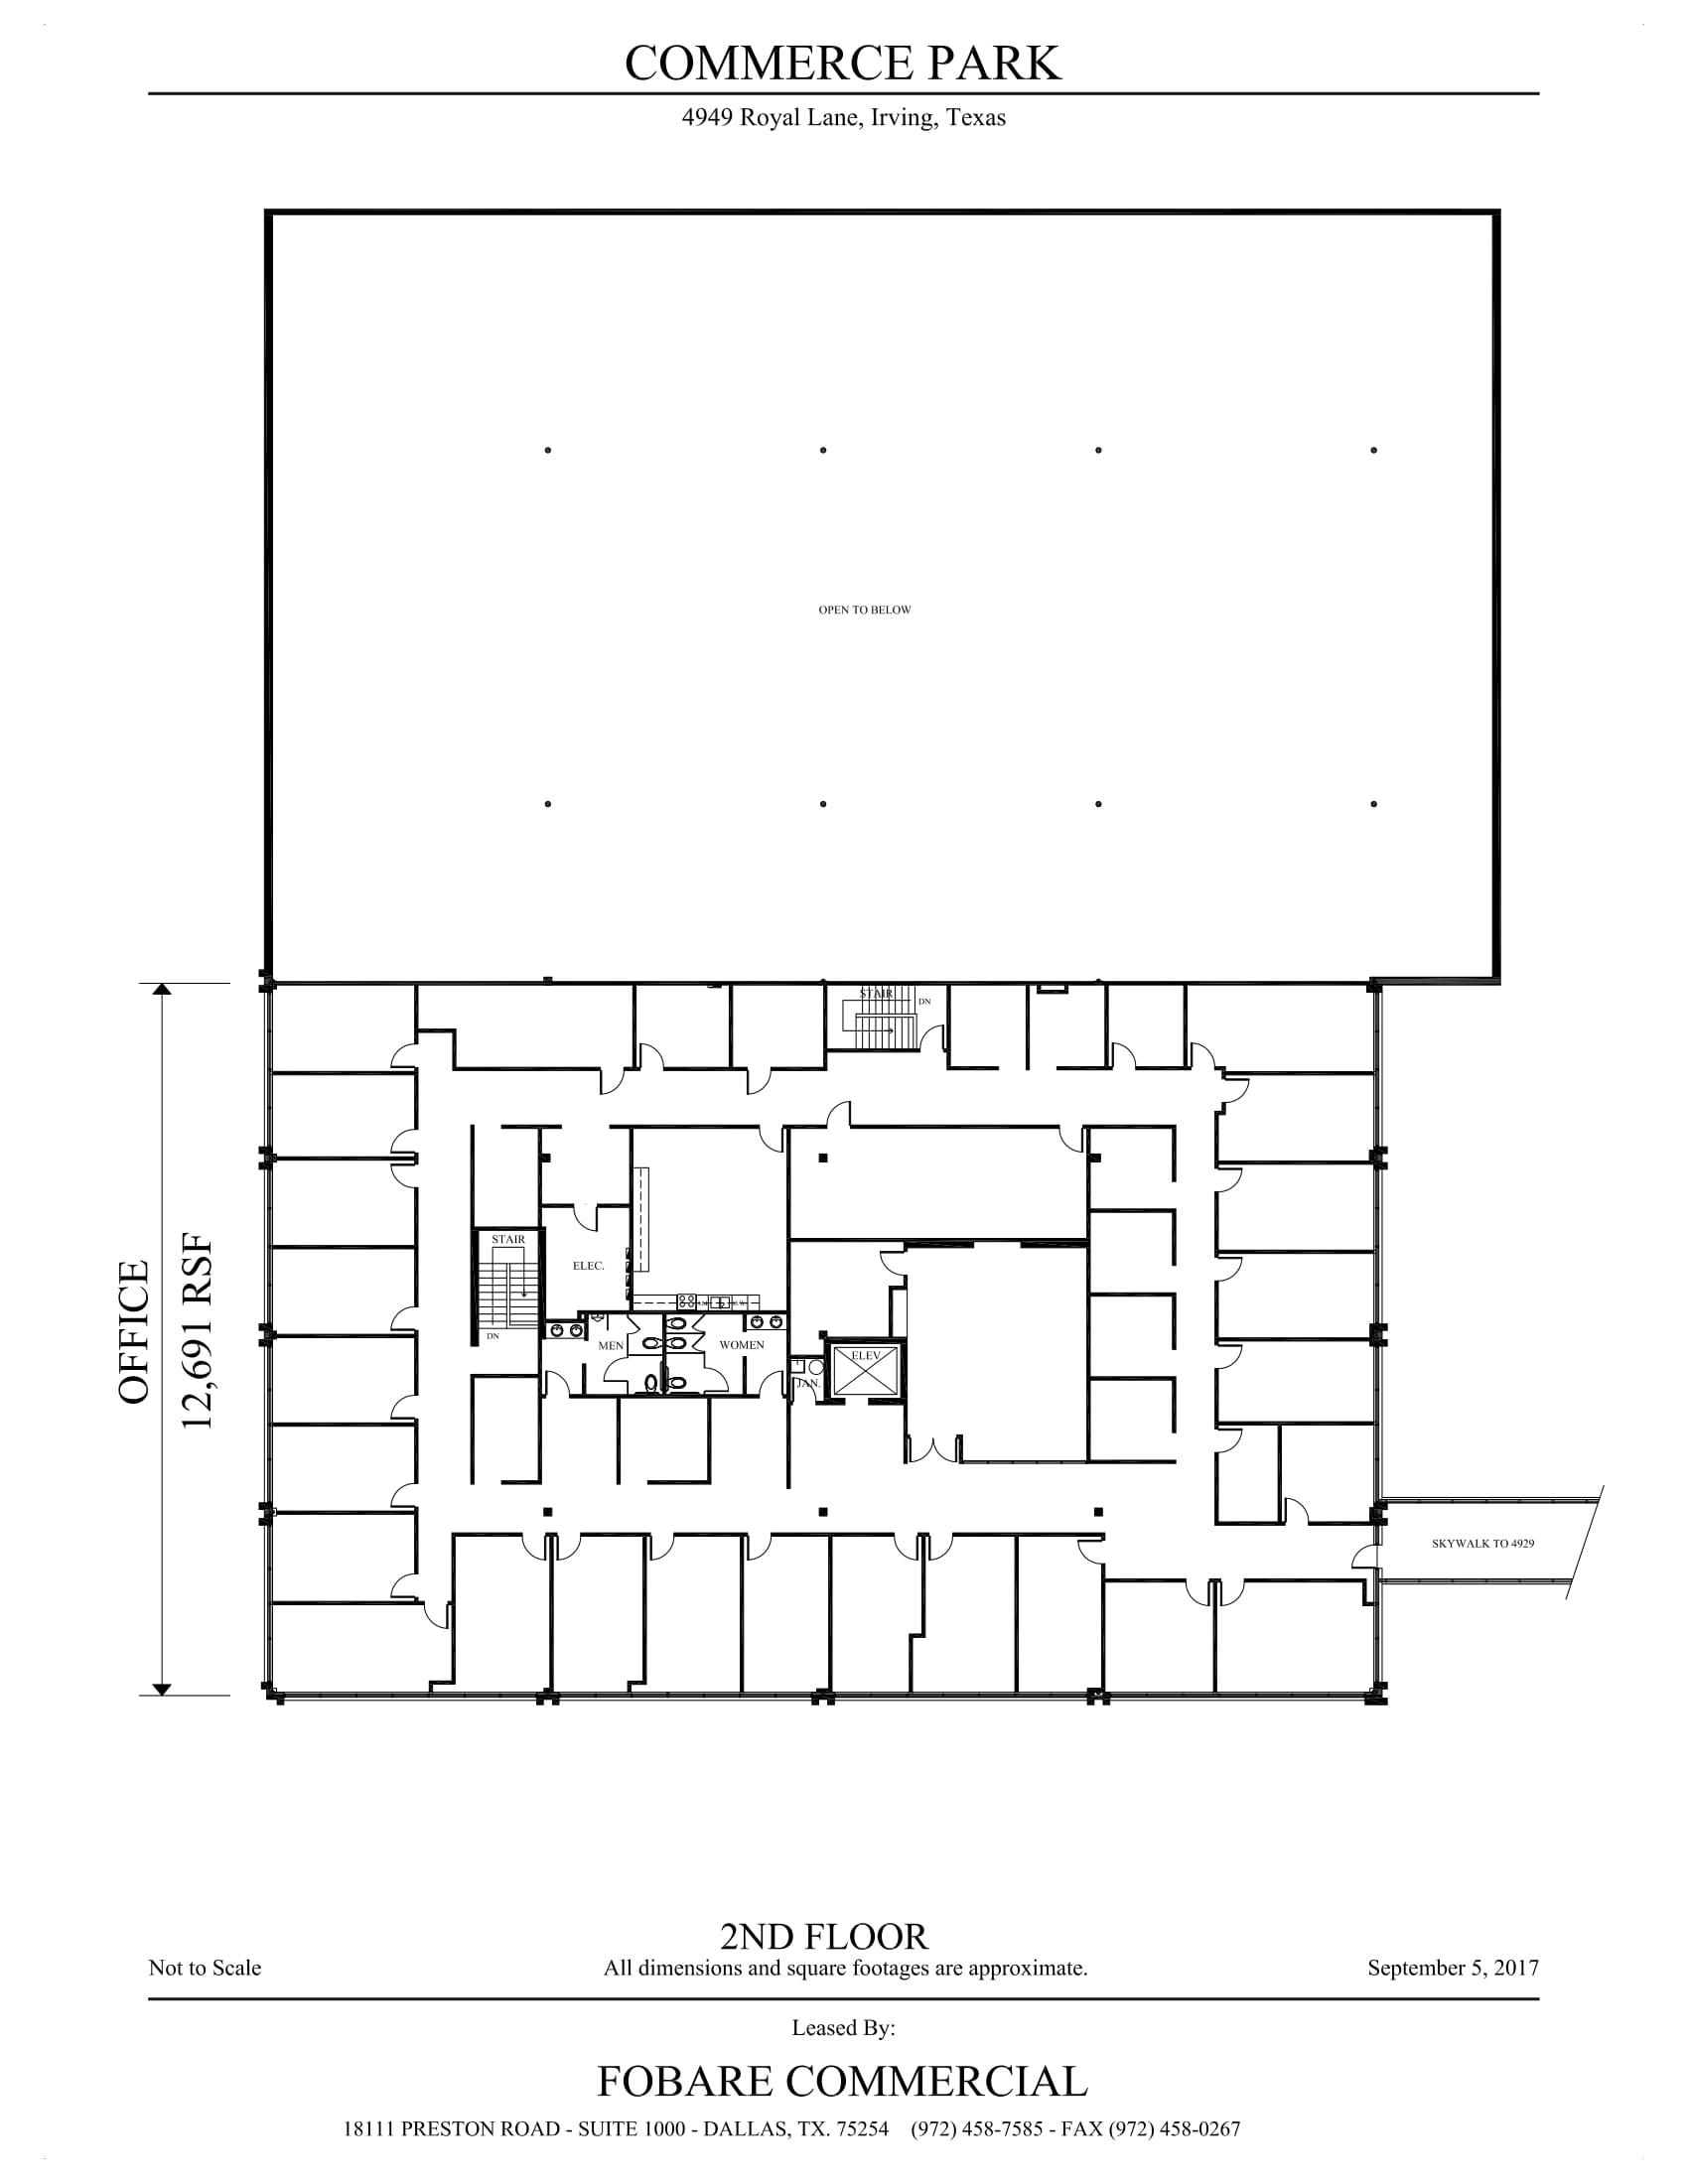 4949 Royal Lane - Commerce - 2nd Floor - SF Calc-1